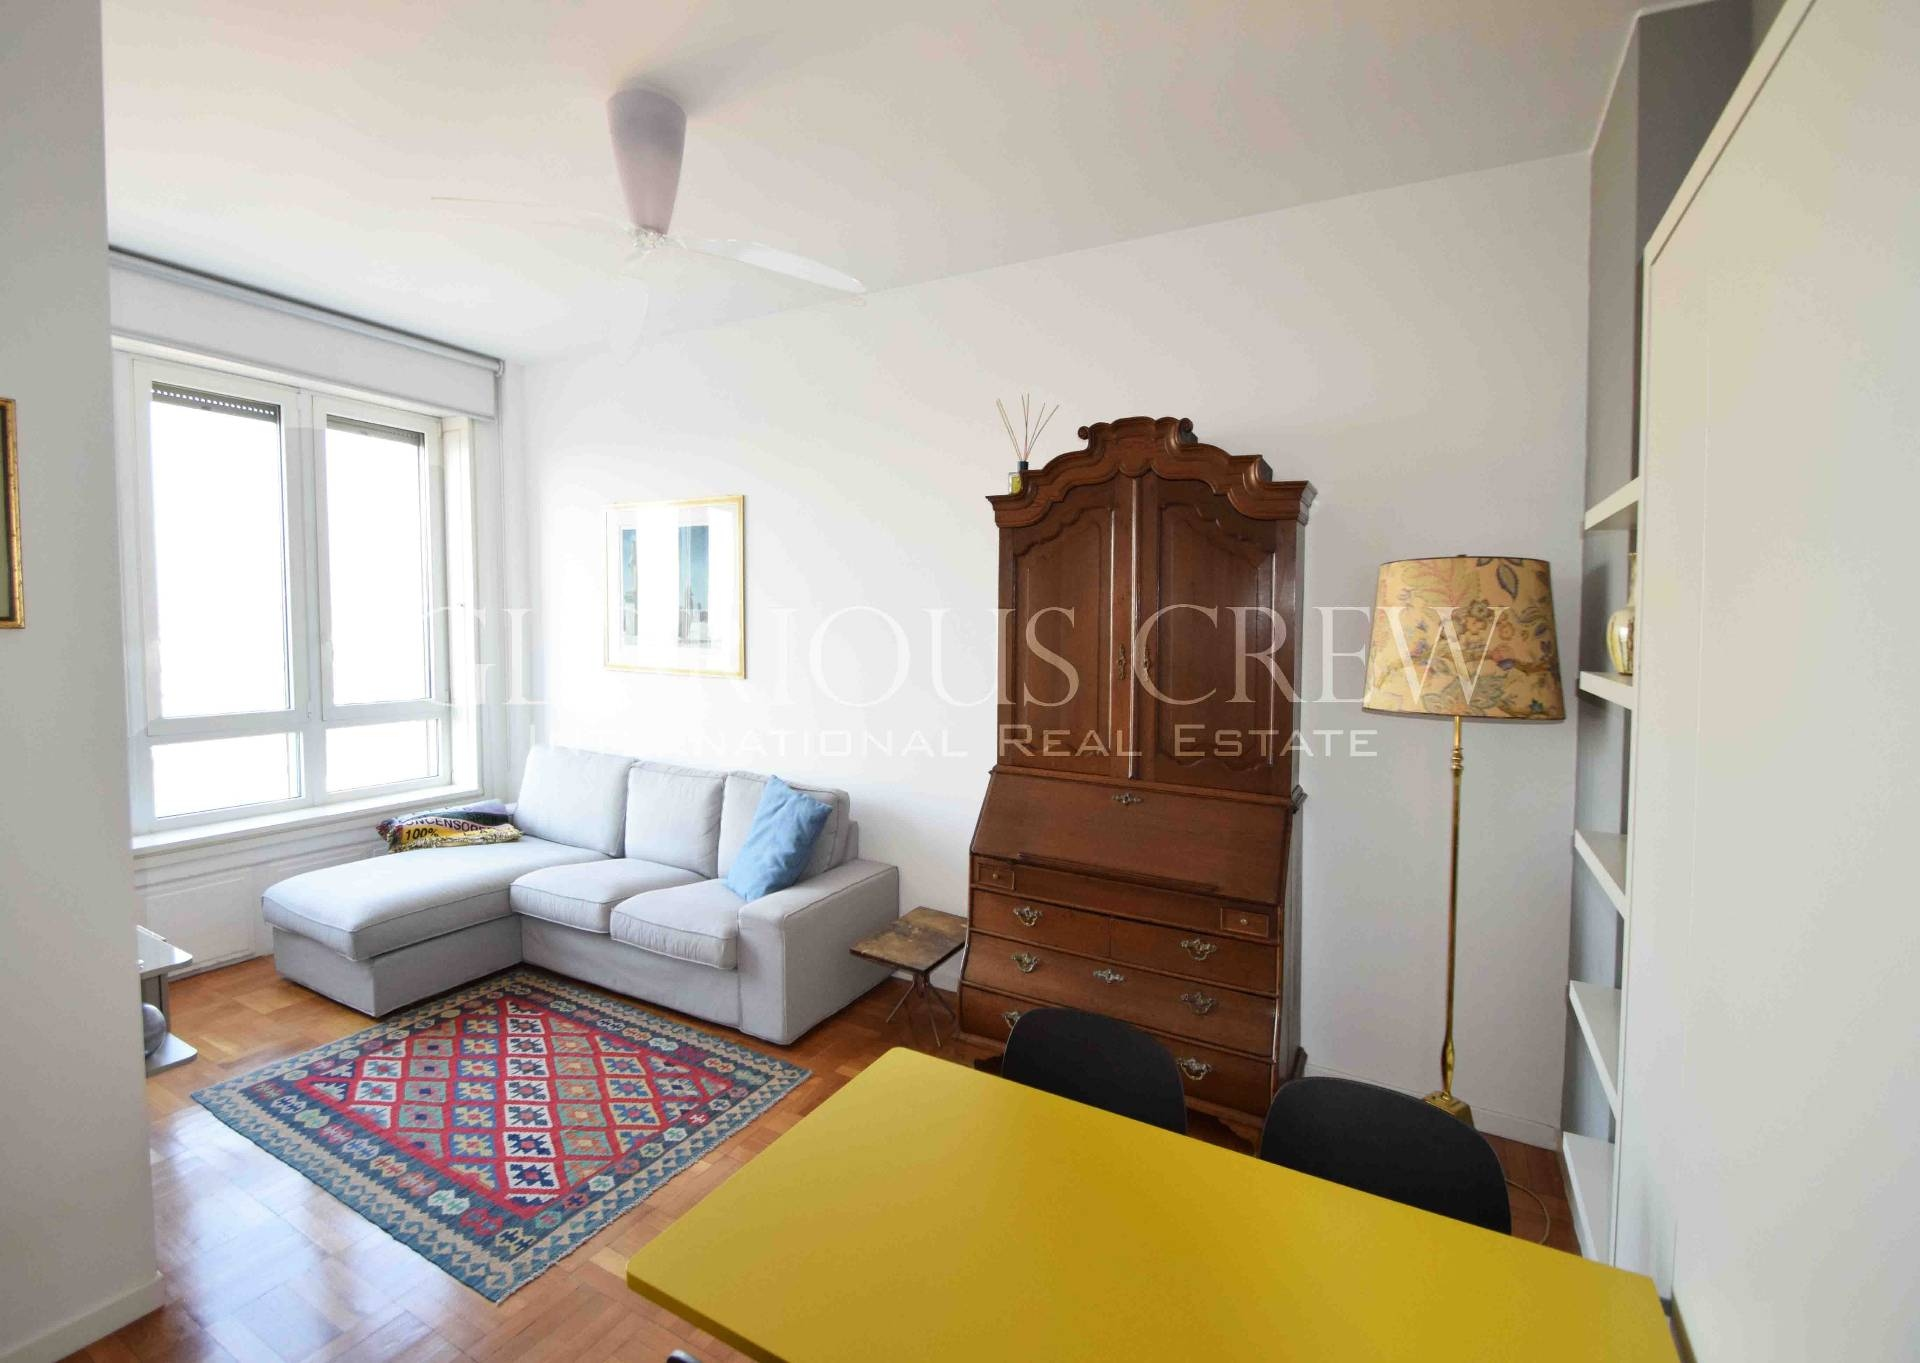 Milano | Appartamento in Affitto in Piazzale Biancamano | lacasadimilano.it